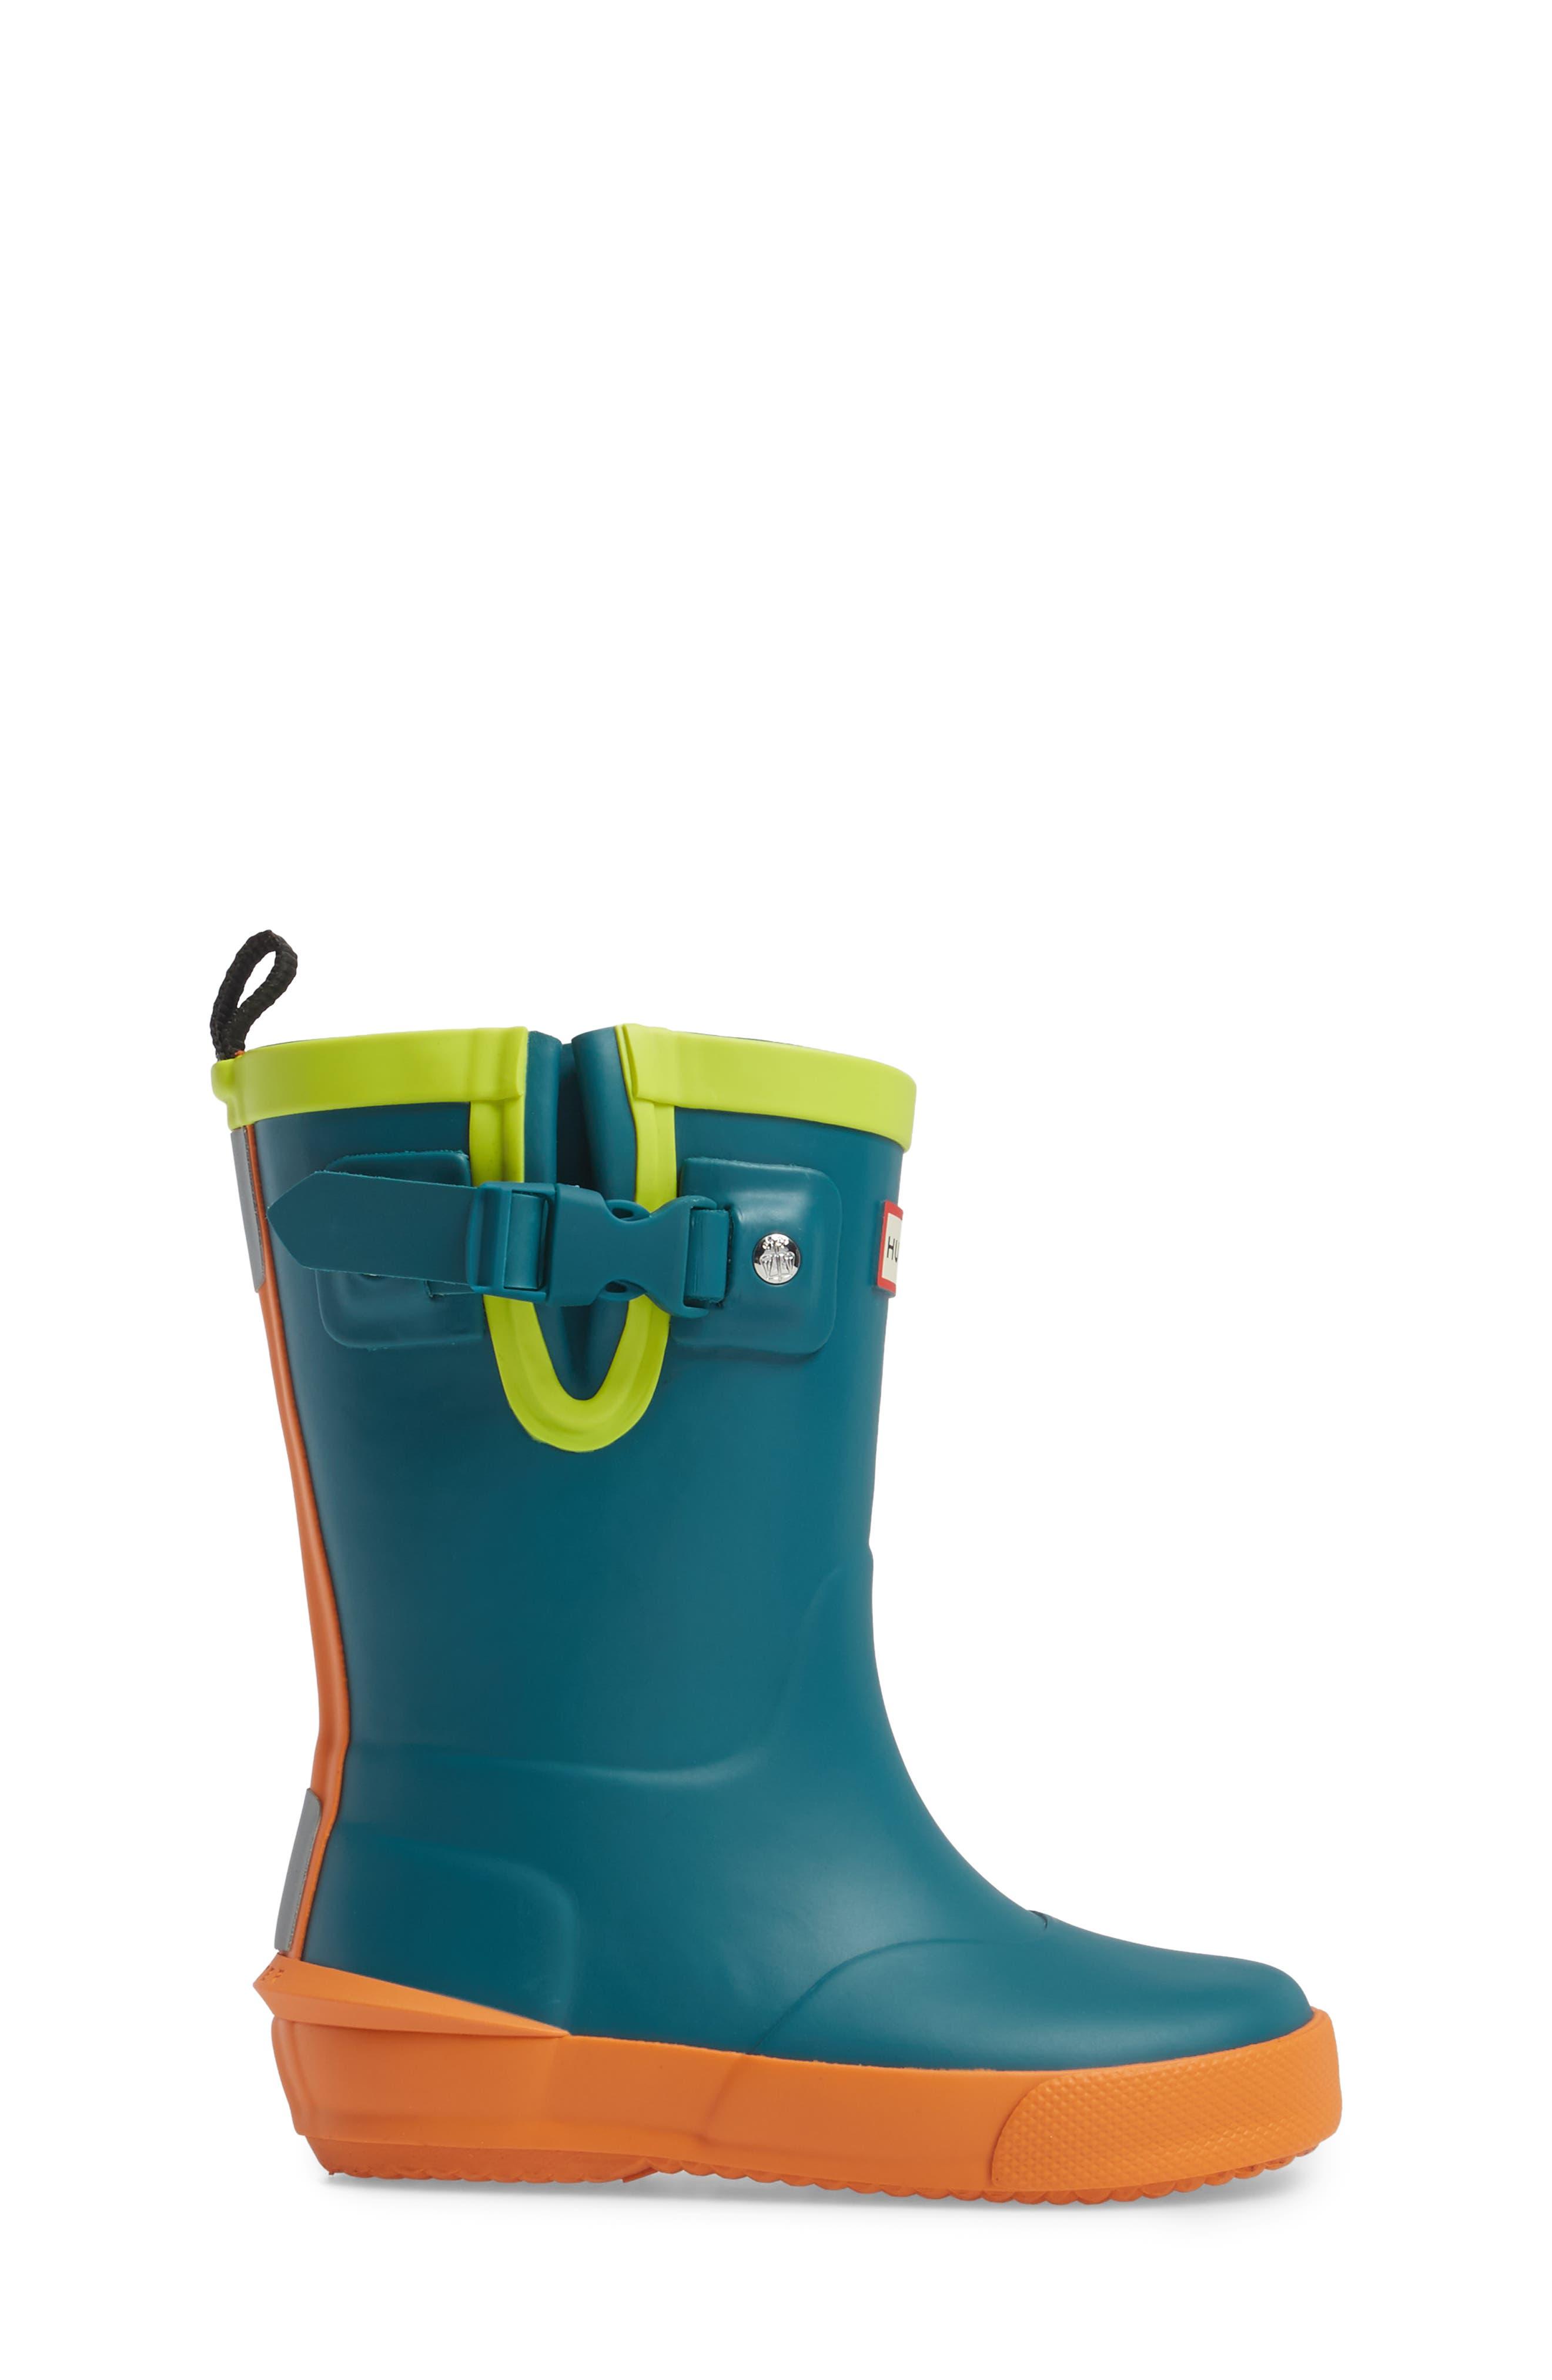 Davison Rain Boot,                             Alternate thumbnail 3, color,                             300